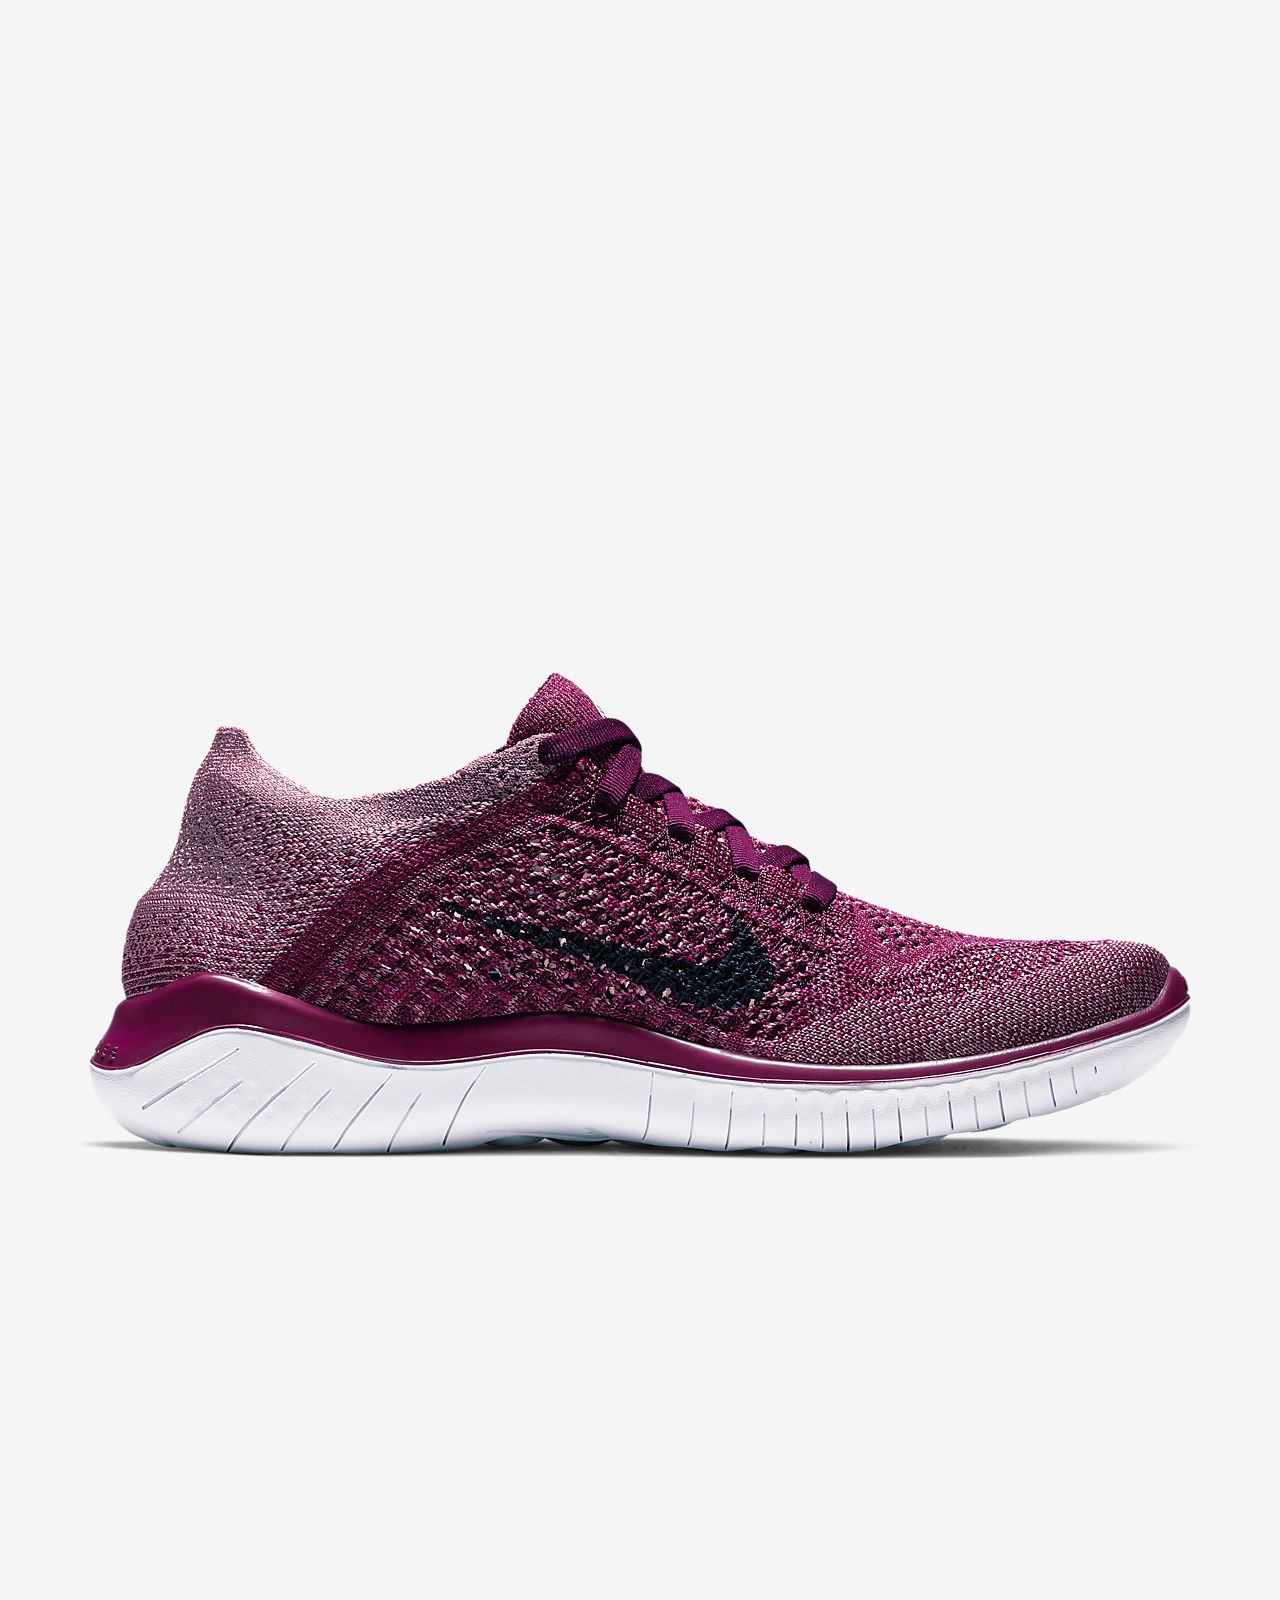 quality design 19084 16a53 ... Nike Free RN Flyknit 2018 Womens Running Shoe